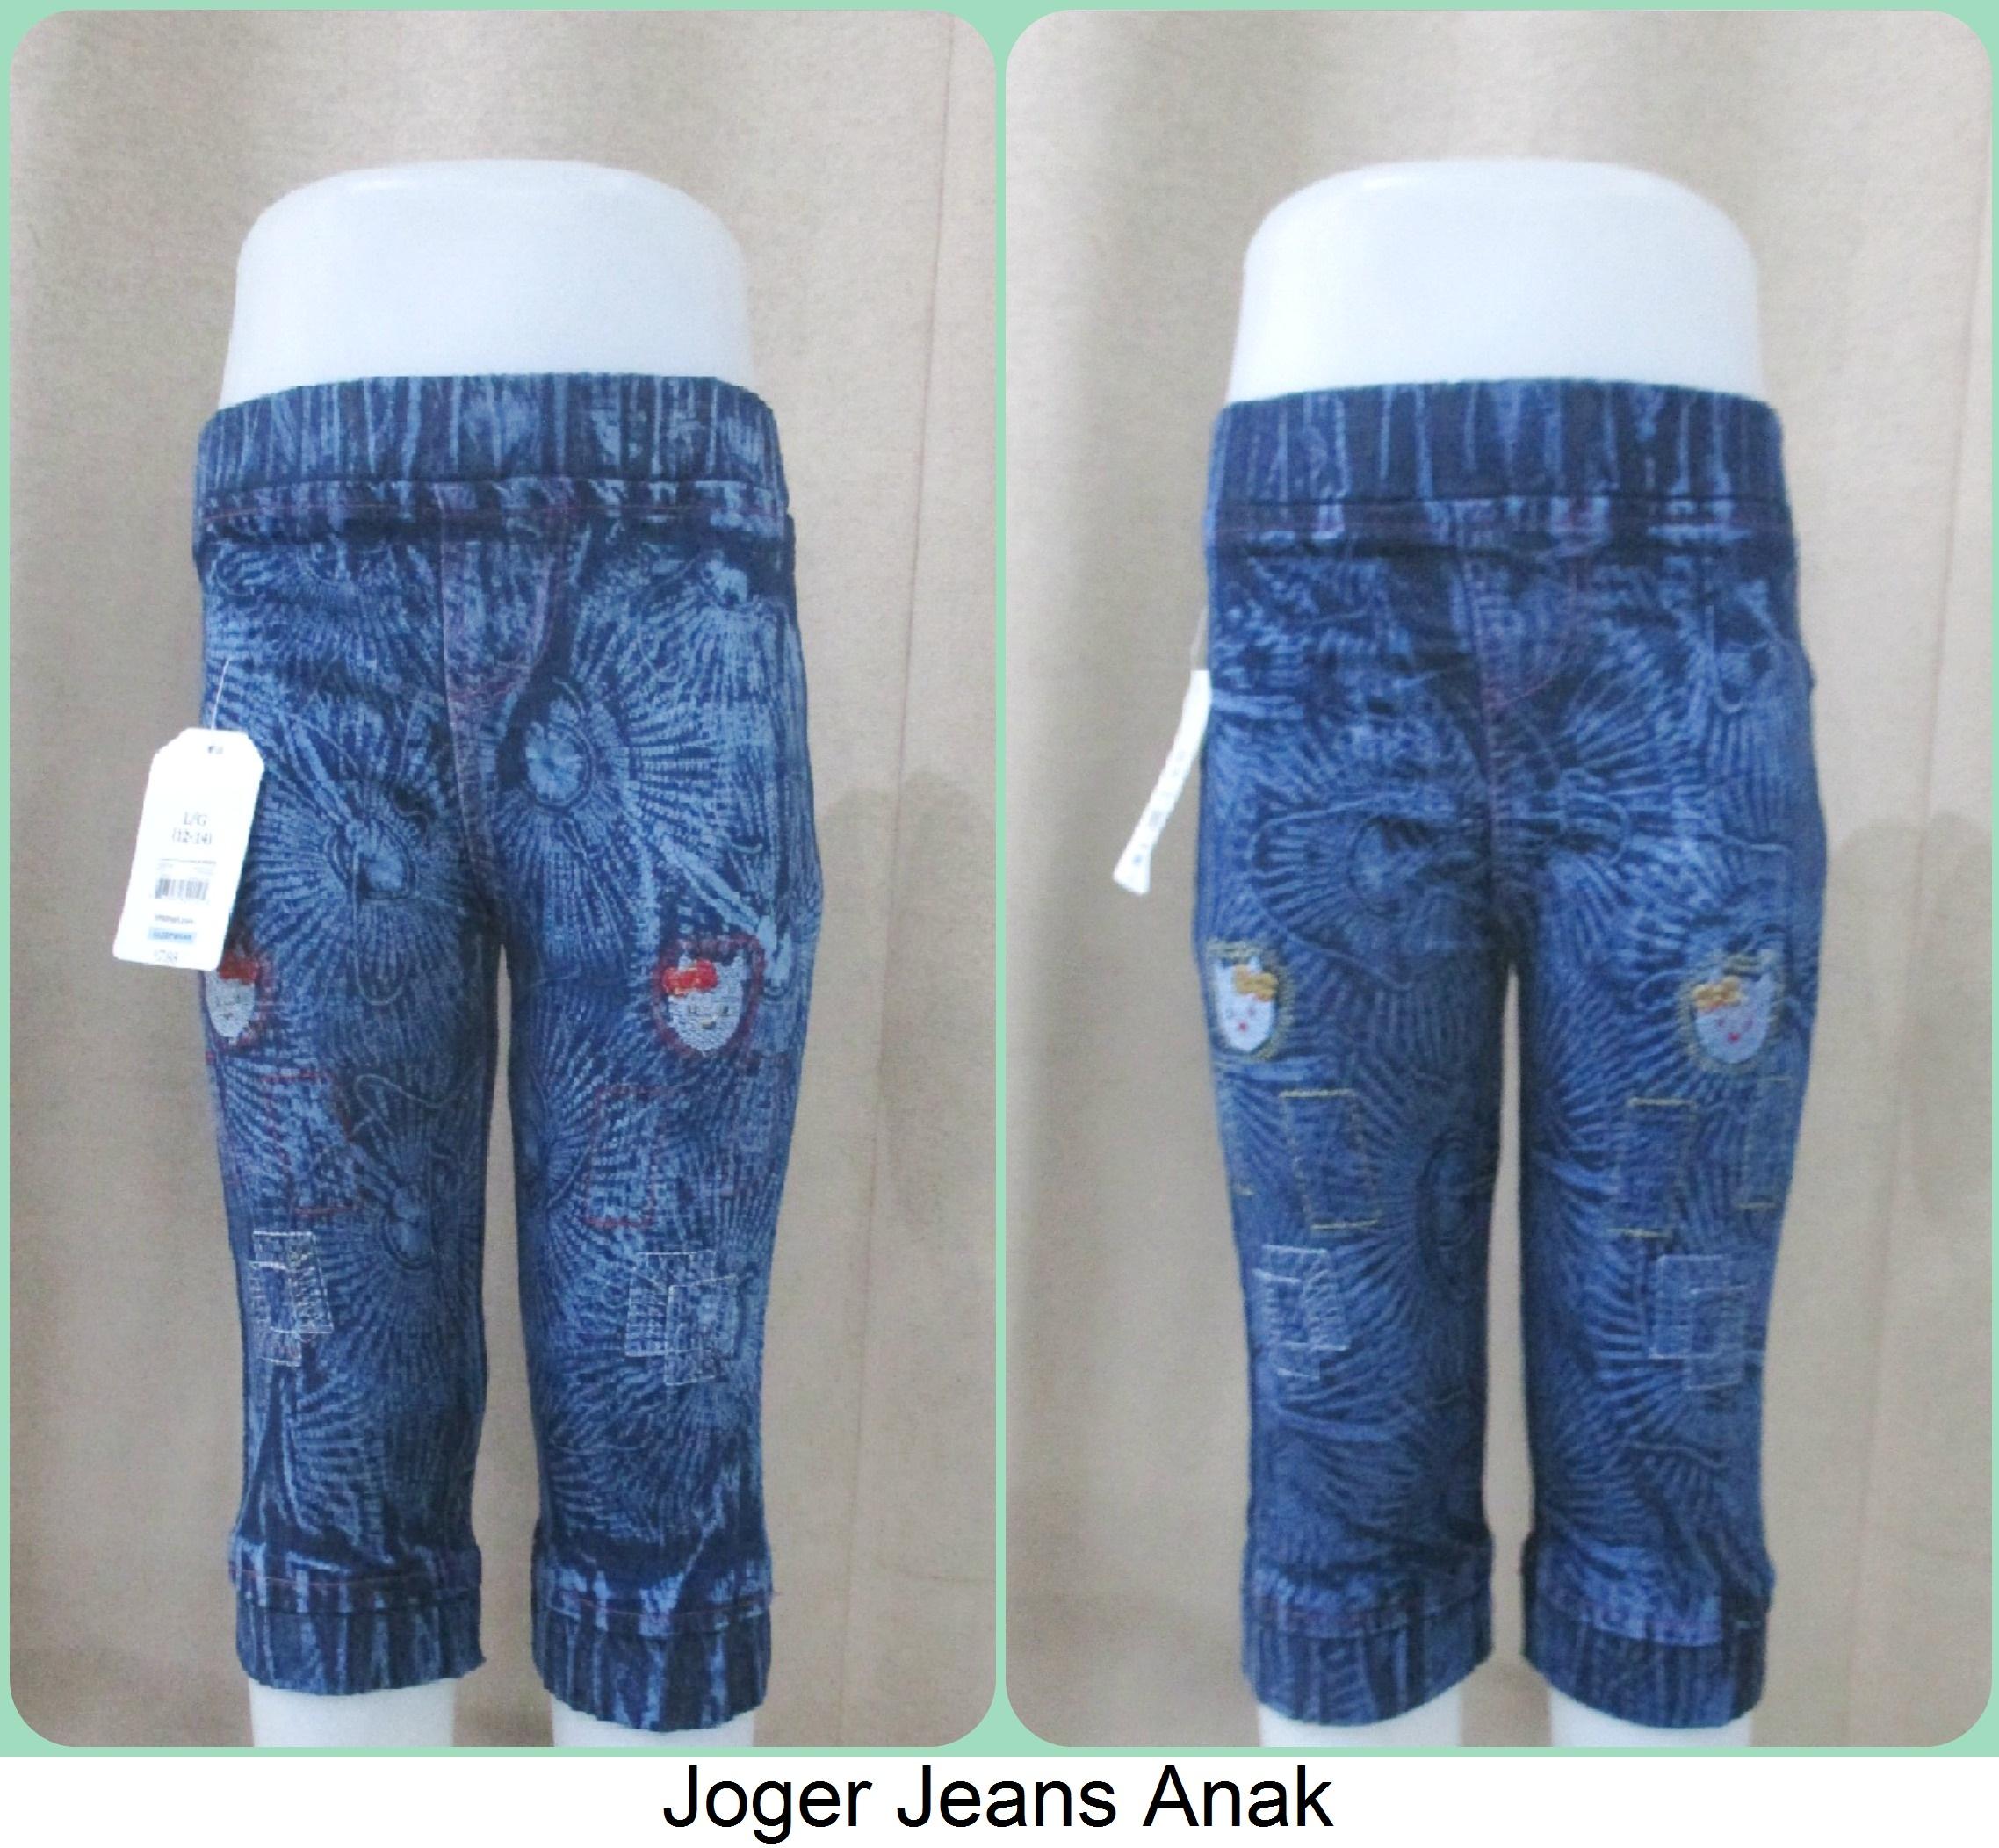 Grosiran Celana Joger Jeans Anak Terbaru Murah Cikarang